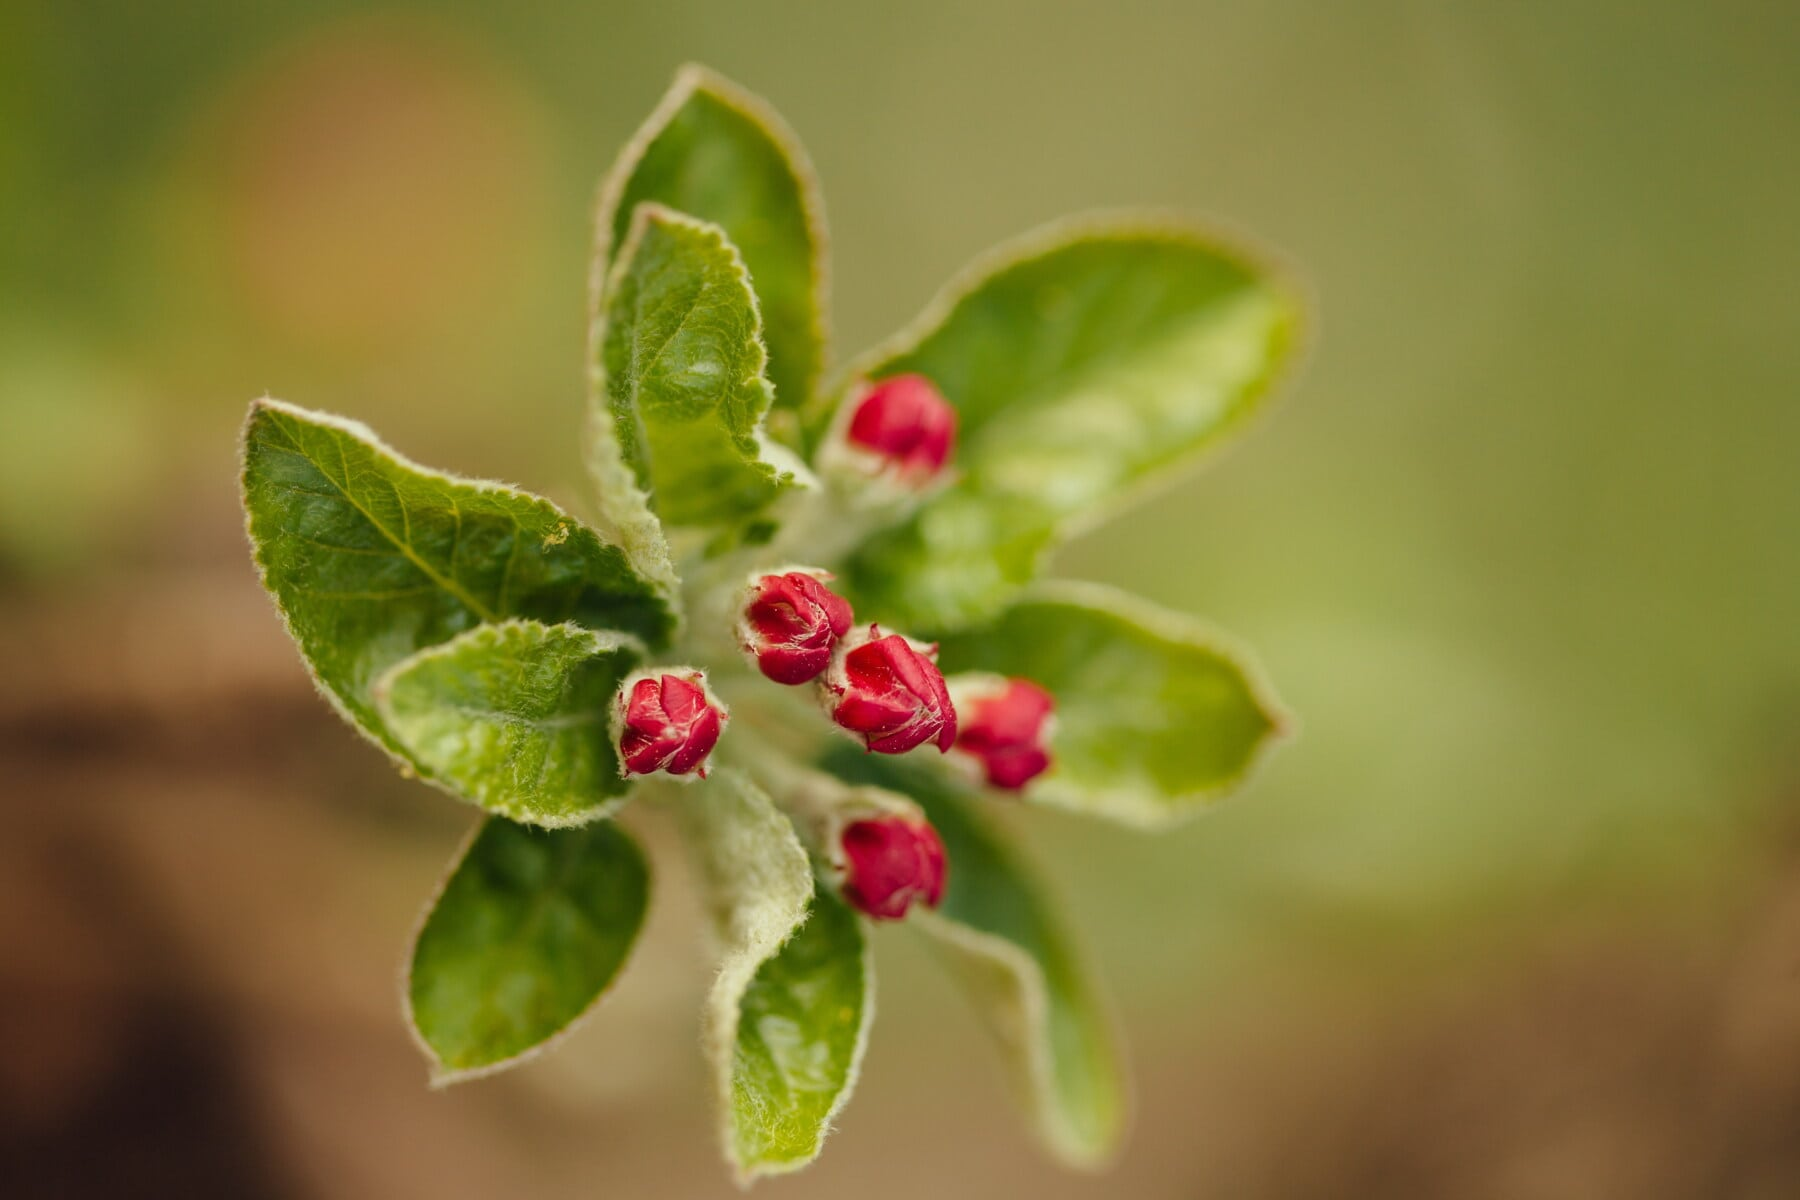 pommier, arbre fruitier, sauvage, fleurs, macro, fermer, brouiller, feuille, nature, plante